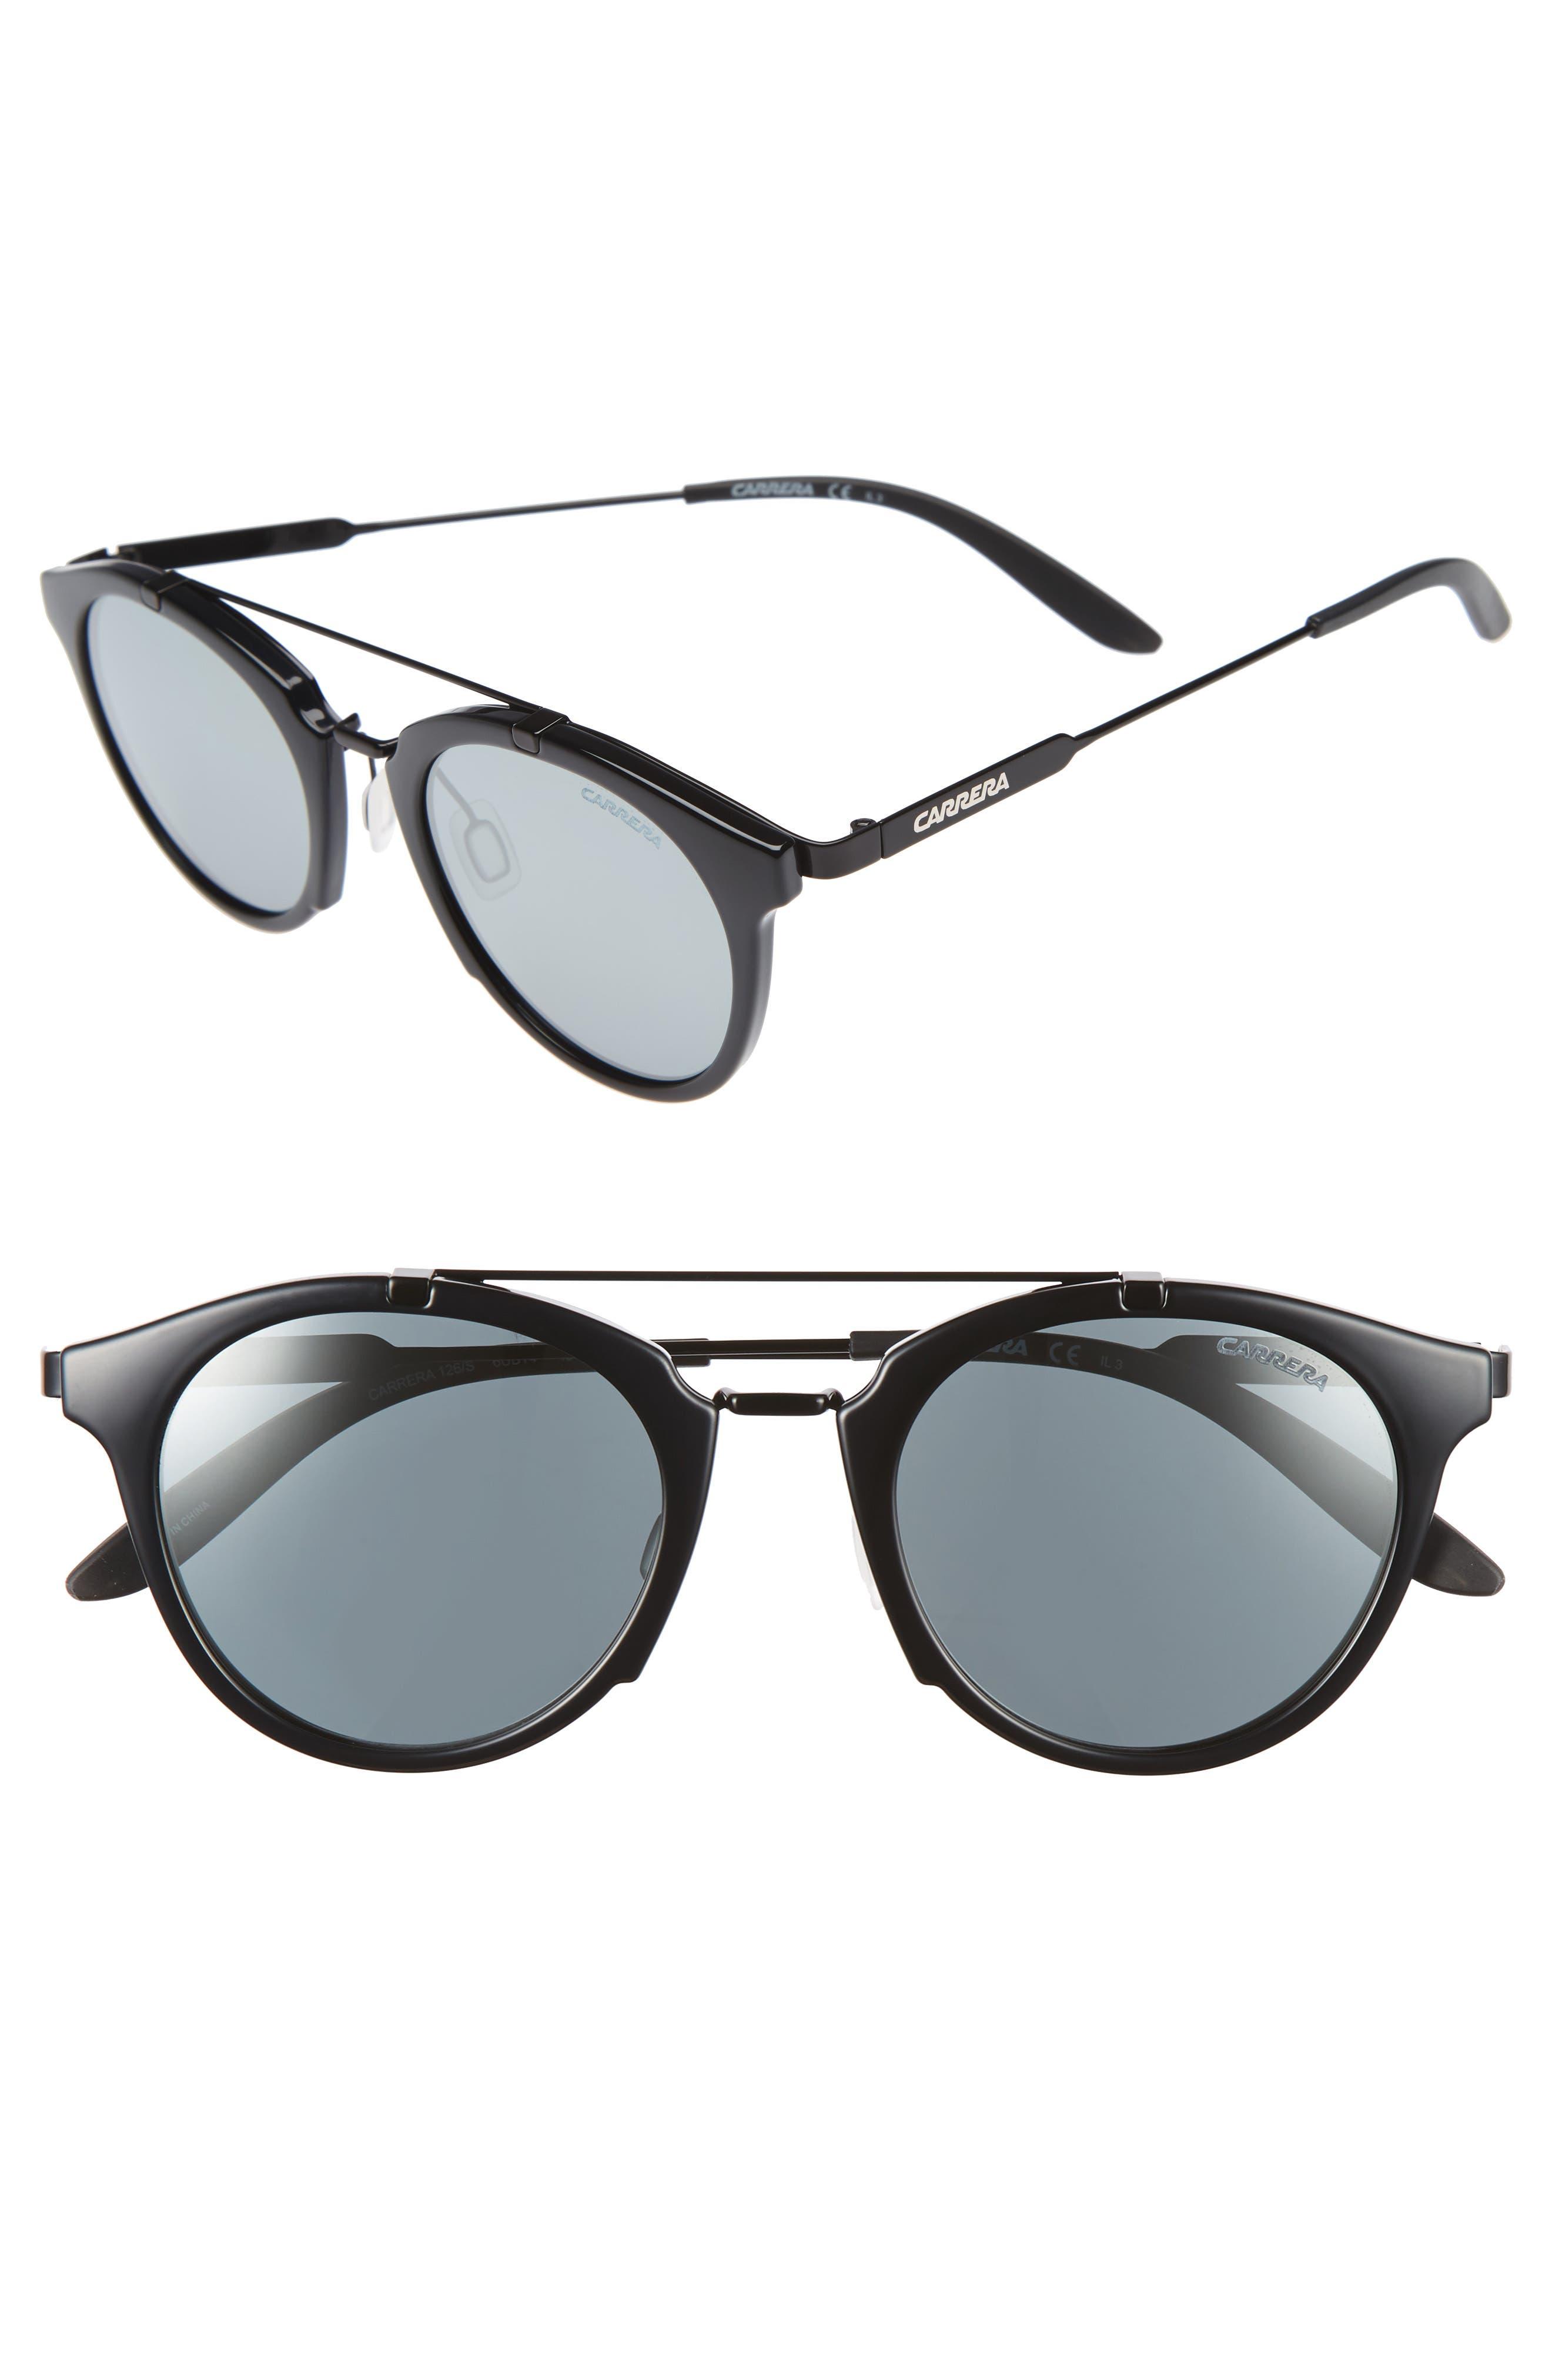 Retro 49mm Sunglasses,                             Main thumbnail 1, color,